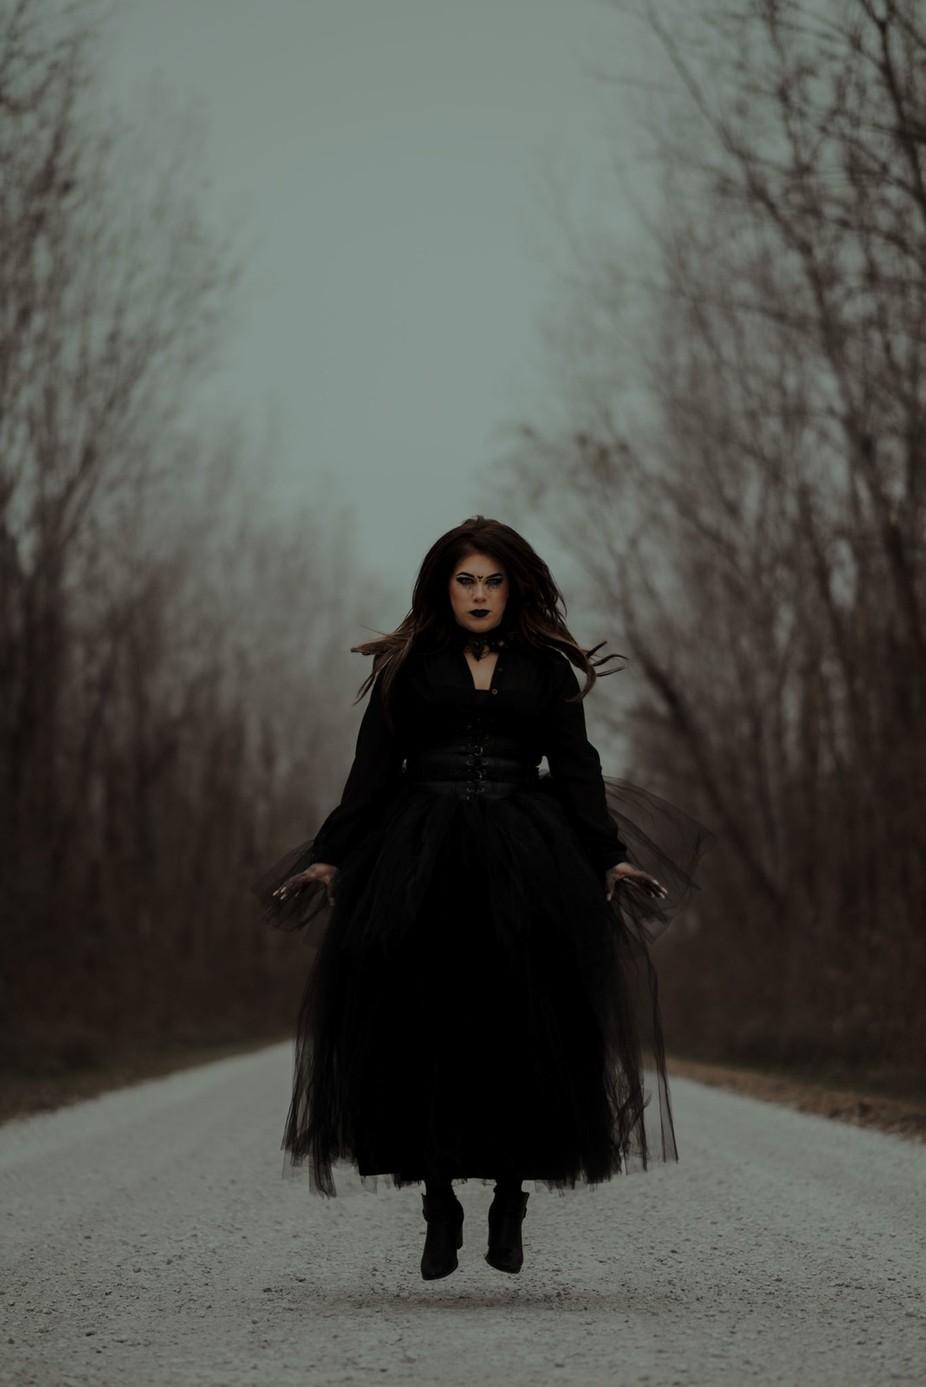 Magic Before Dark  by crystaldiane - Halloween Photo Contest 2017